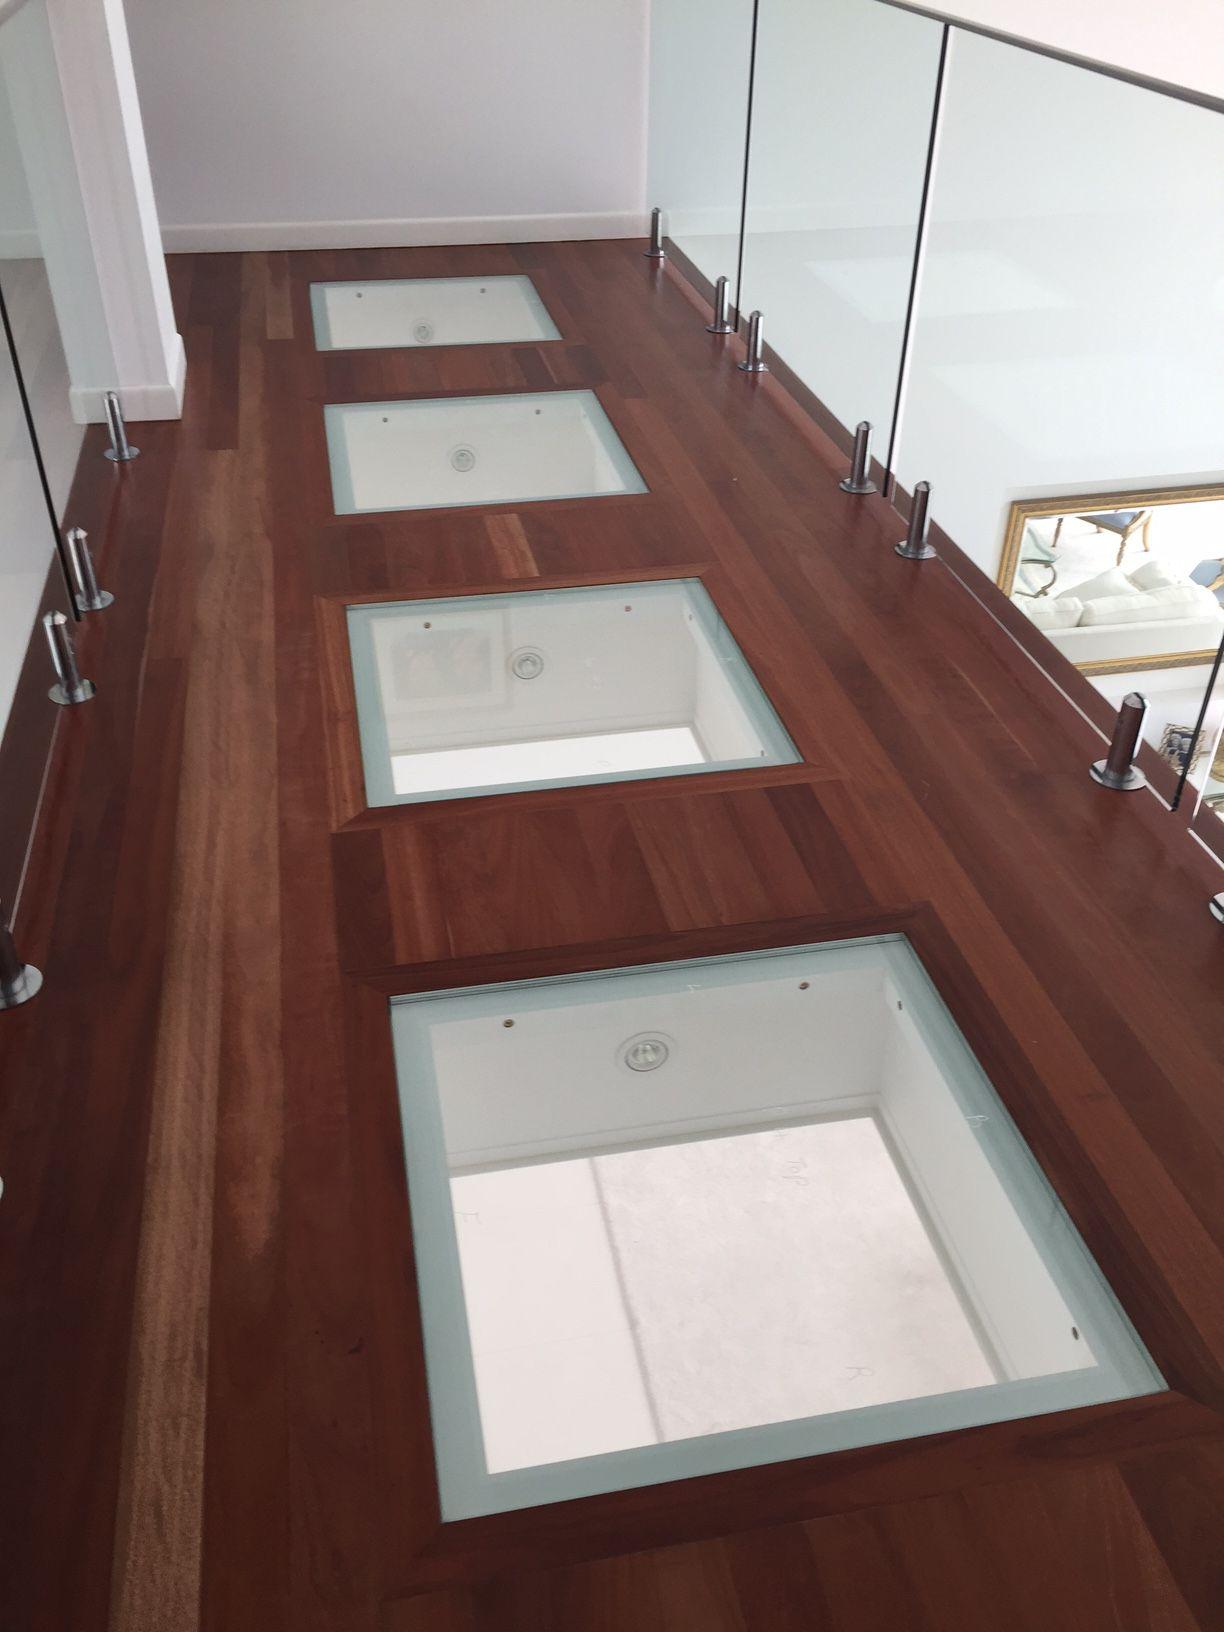 Glass and timber in great bination glassfloor floorfeature glassbalustrade